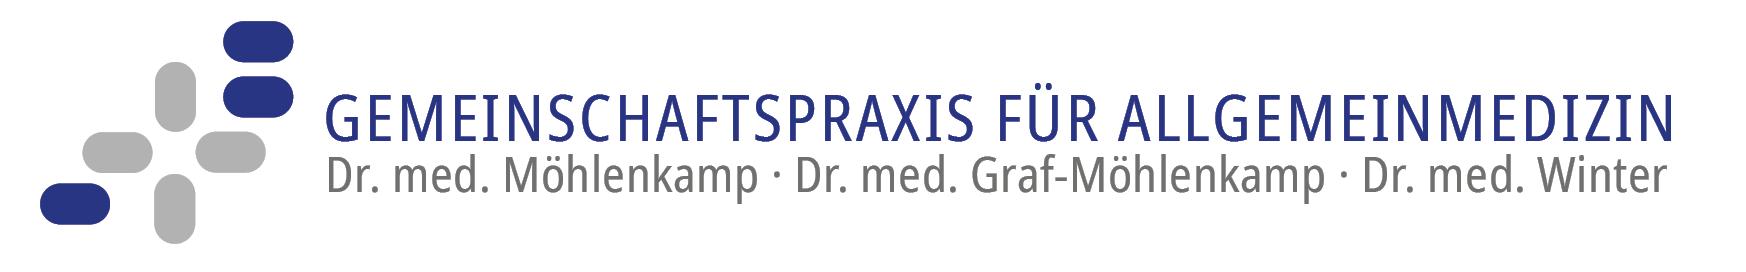 Praxis Dr. Möhlenkamp Dr. Winter